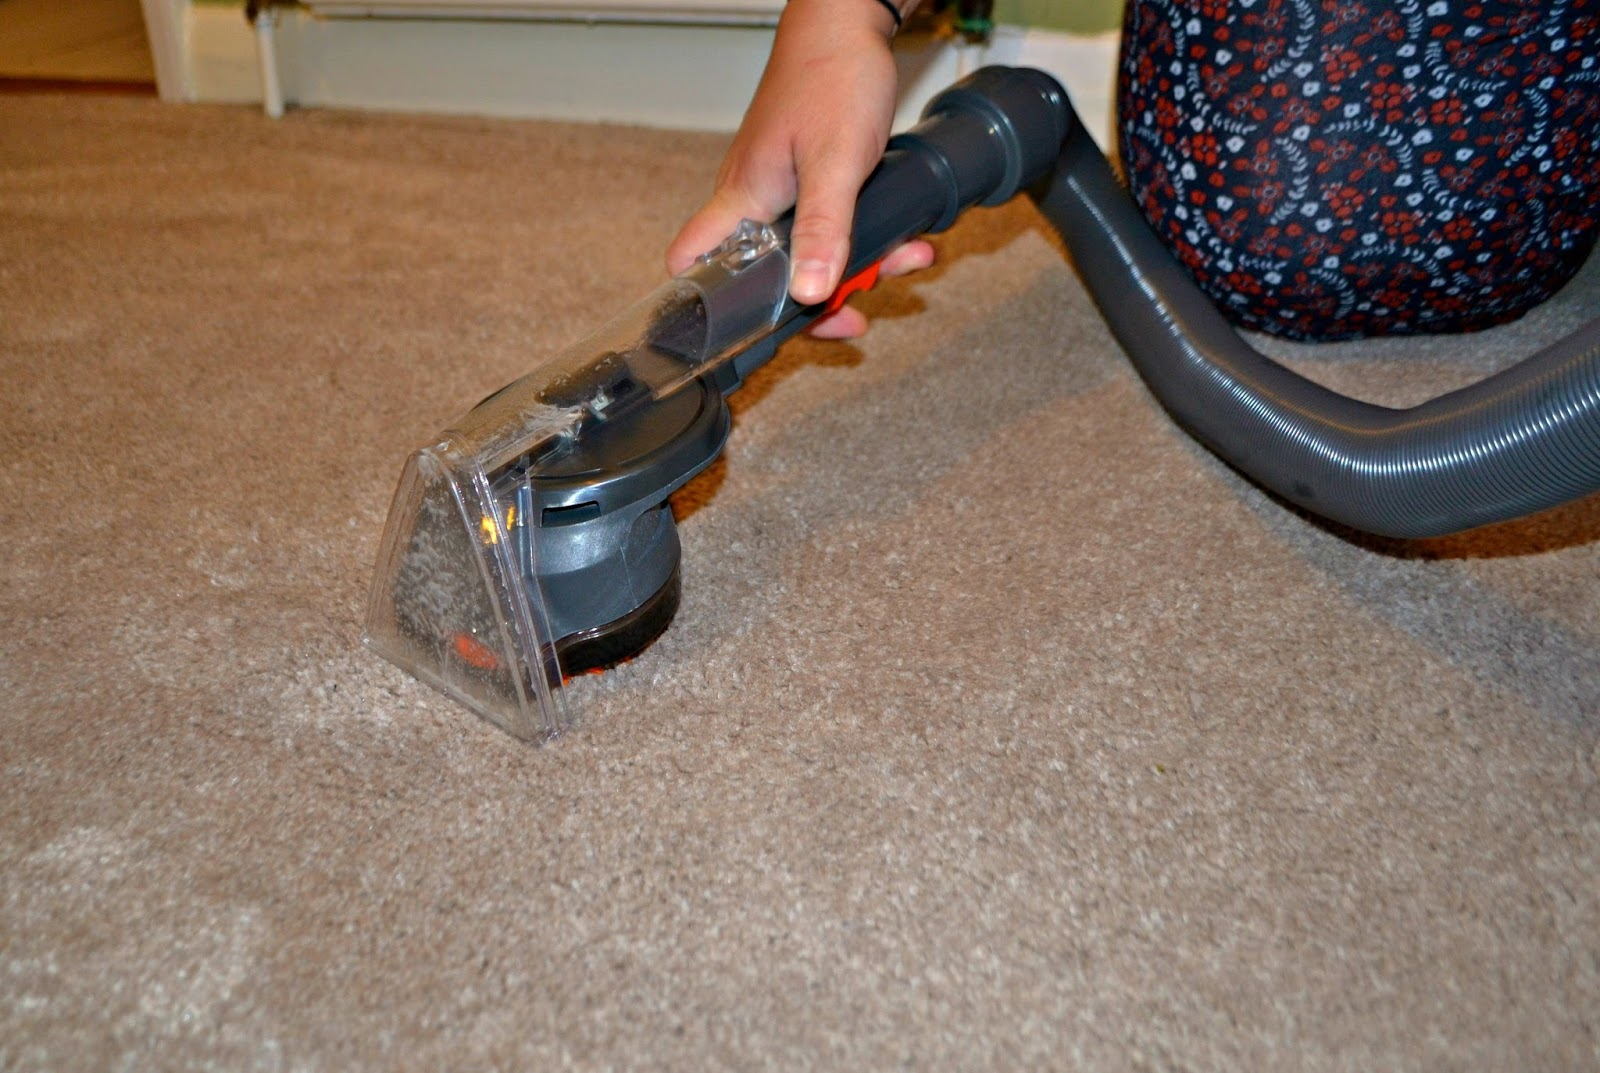 Vax Carpet Cleaner Spring Clean Carpet Vidalondon